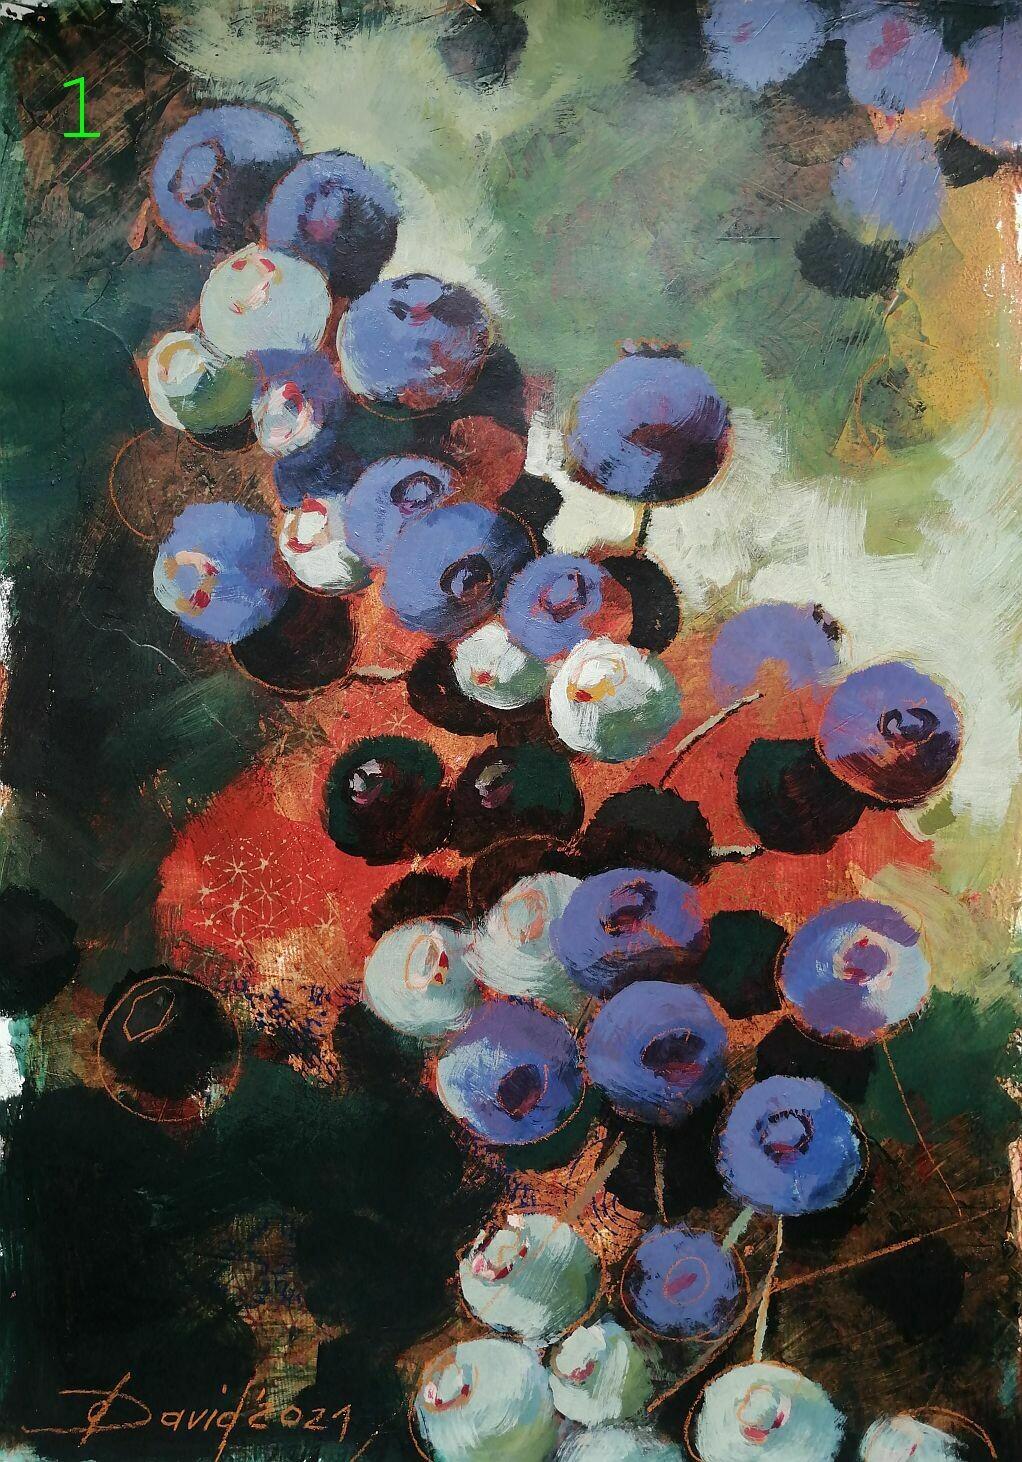 Florales, Original Acryl / Öl Bilder auf Papier, Kleinformat 30x40 cm